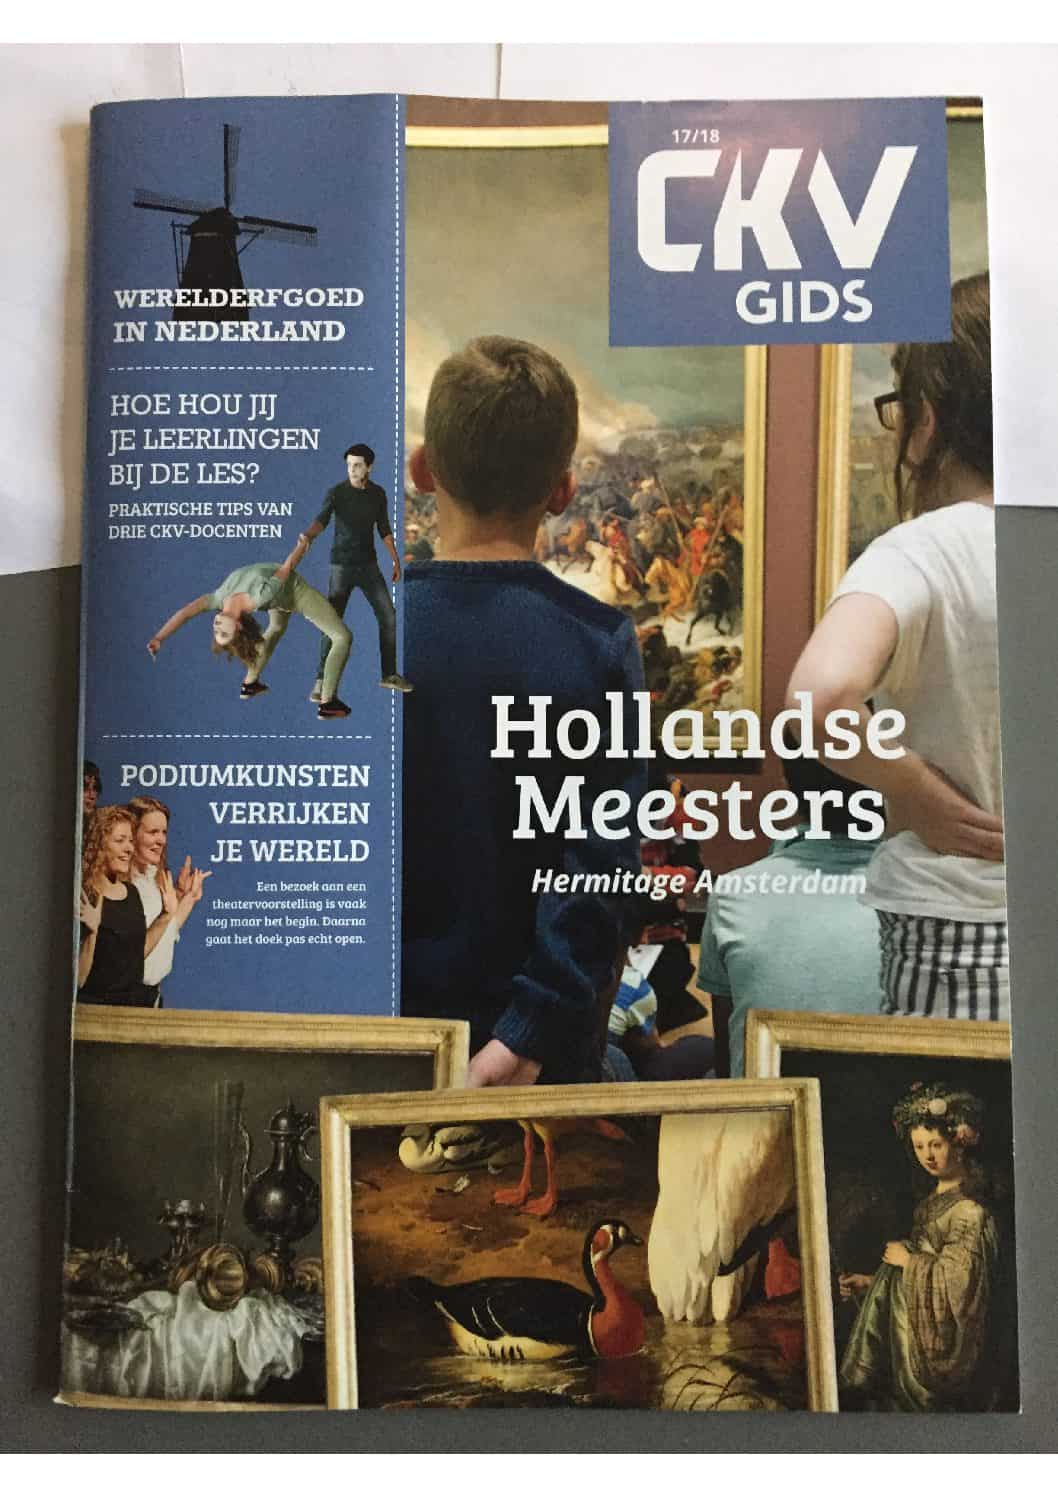 Werelderfgoed in Nederland CKV gids 2017/2018